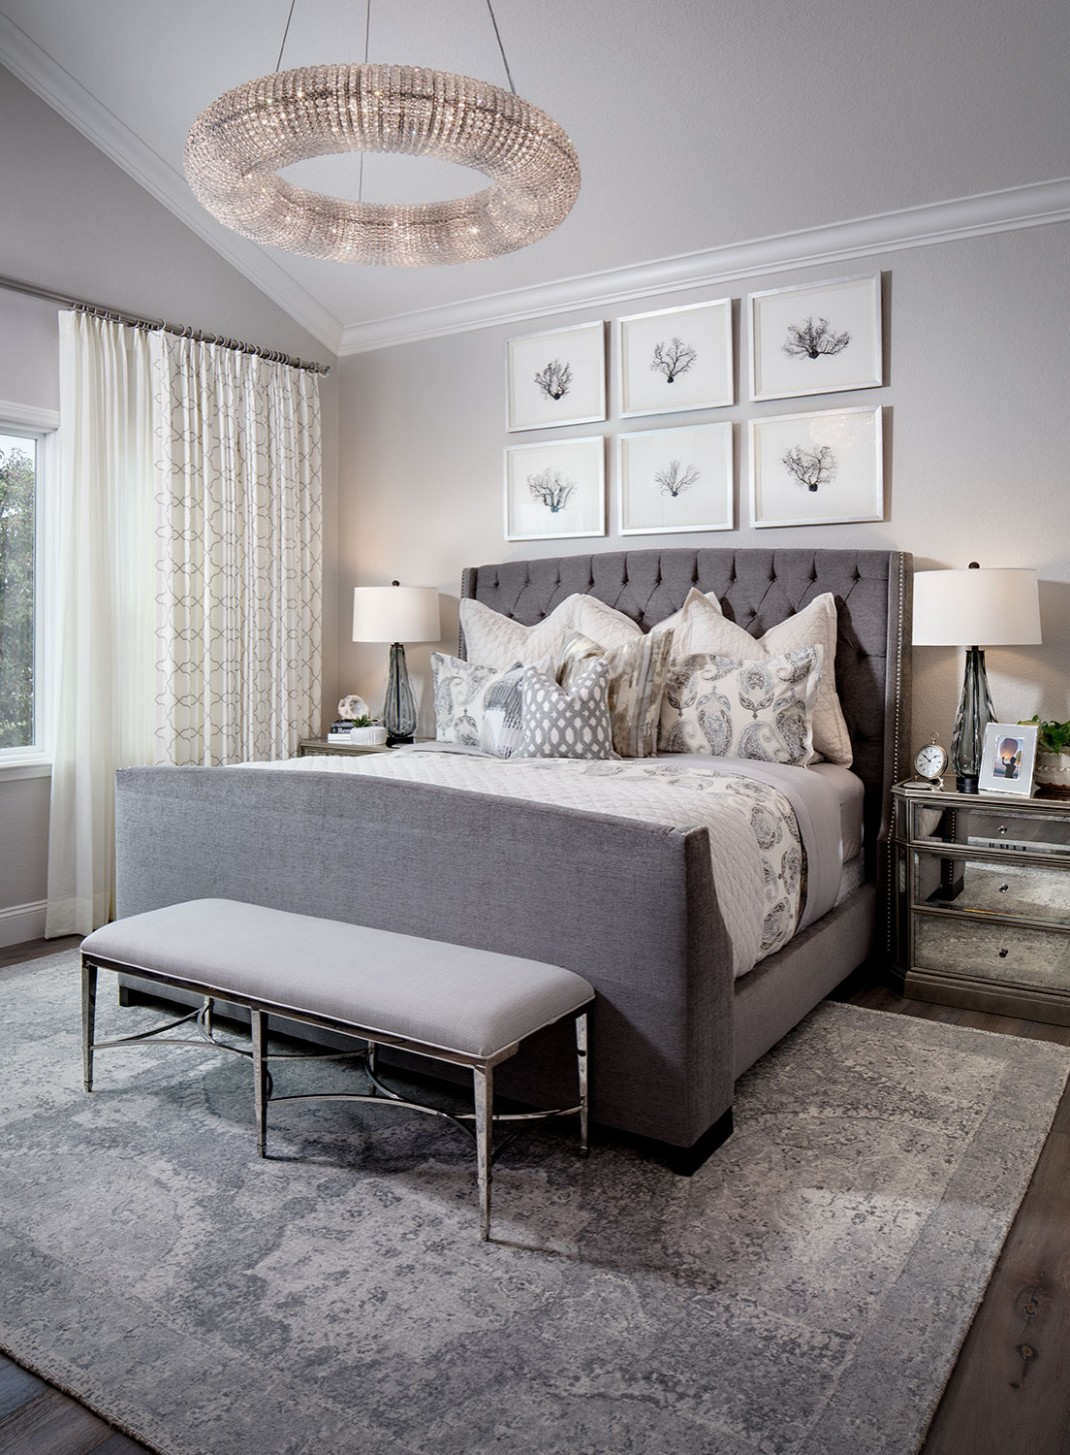 12 Beautiful Gray Bedroom Pictures & Ideas - November, 12  Houzz - Bedroom Ideas Grey Bed